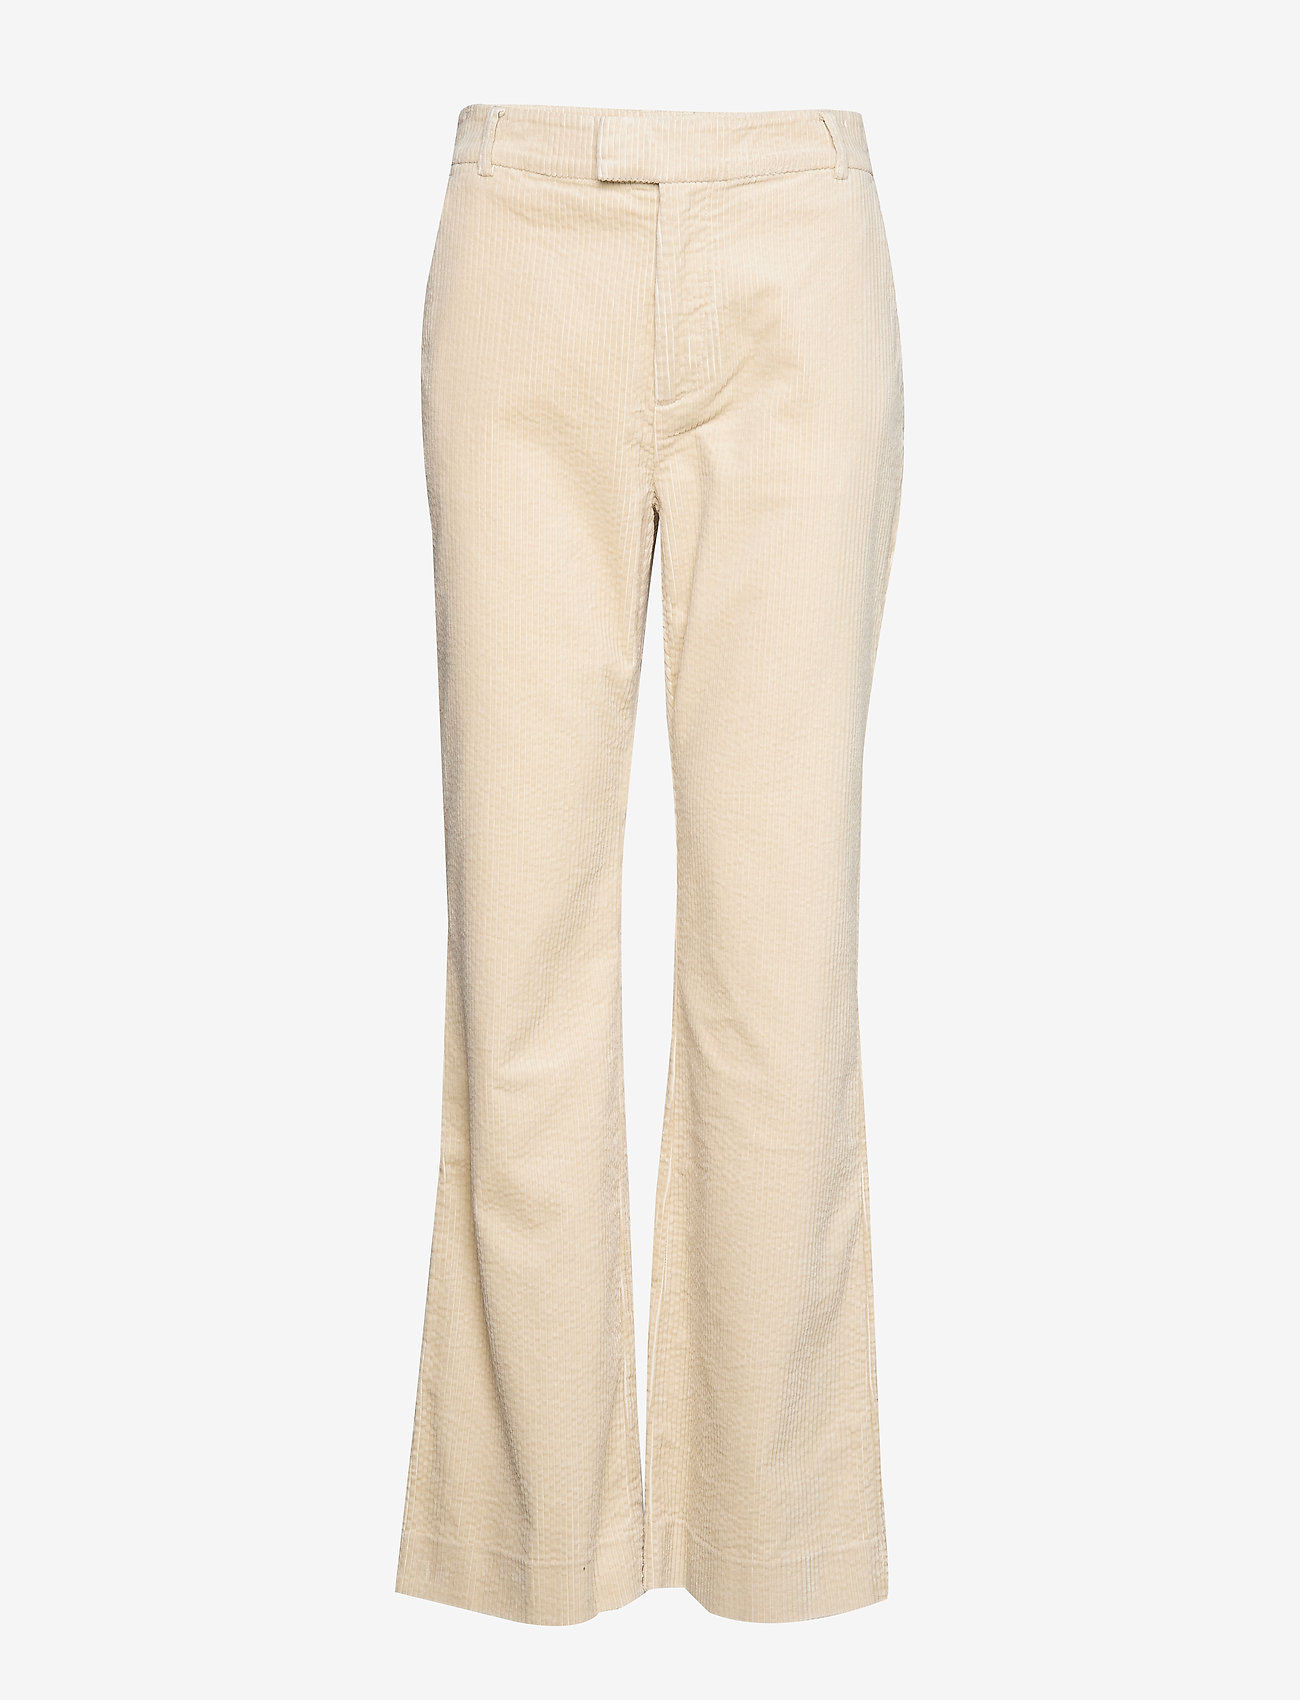 Noa Noa - Trousers - uitlopende broeken - oatmeal - 0